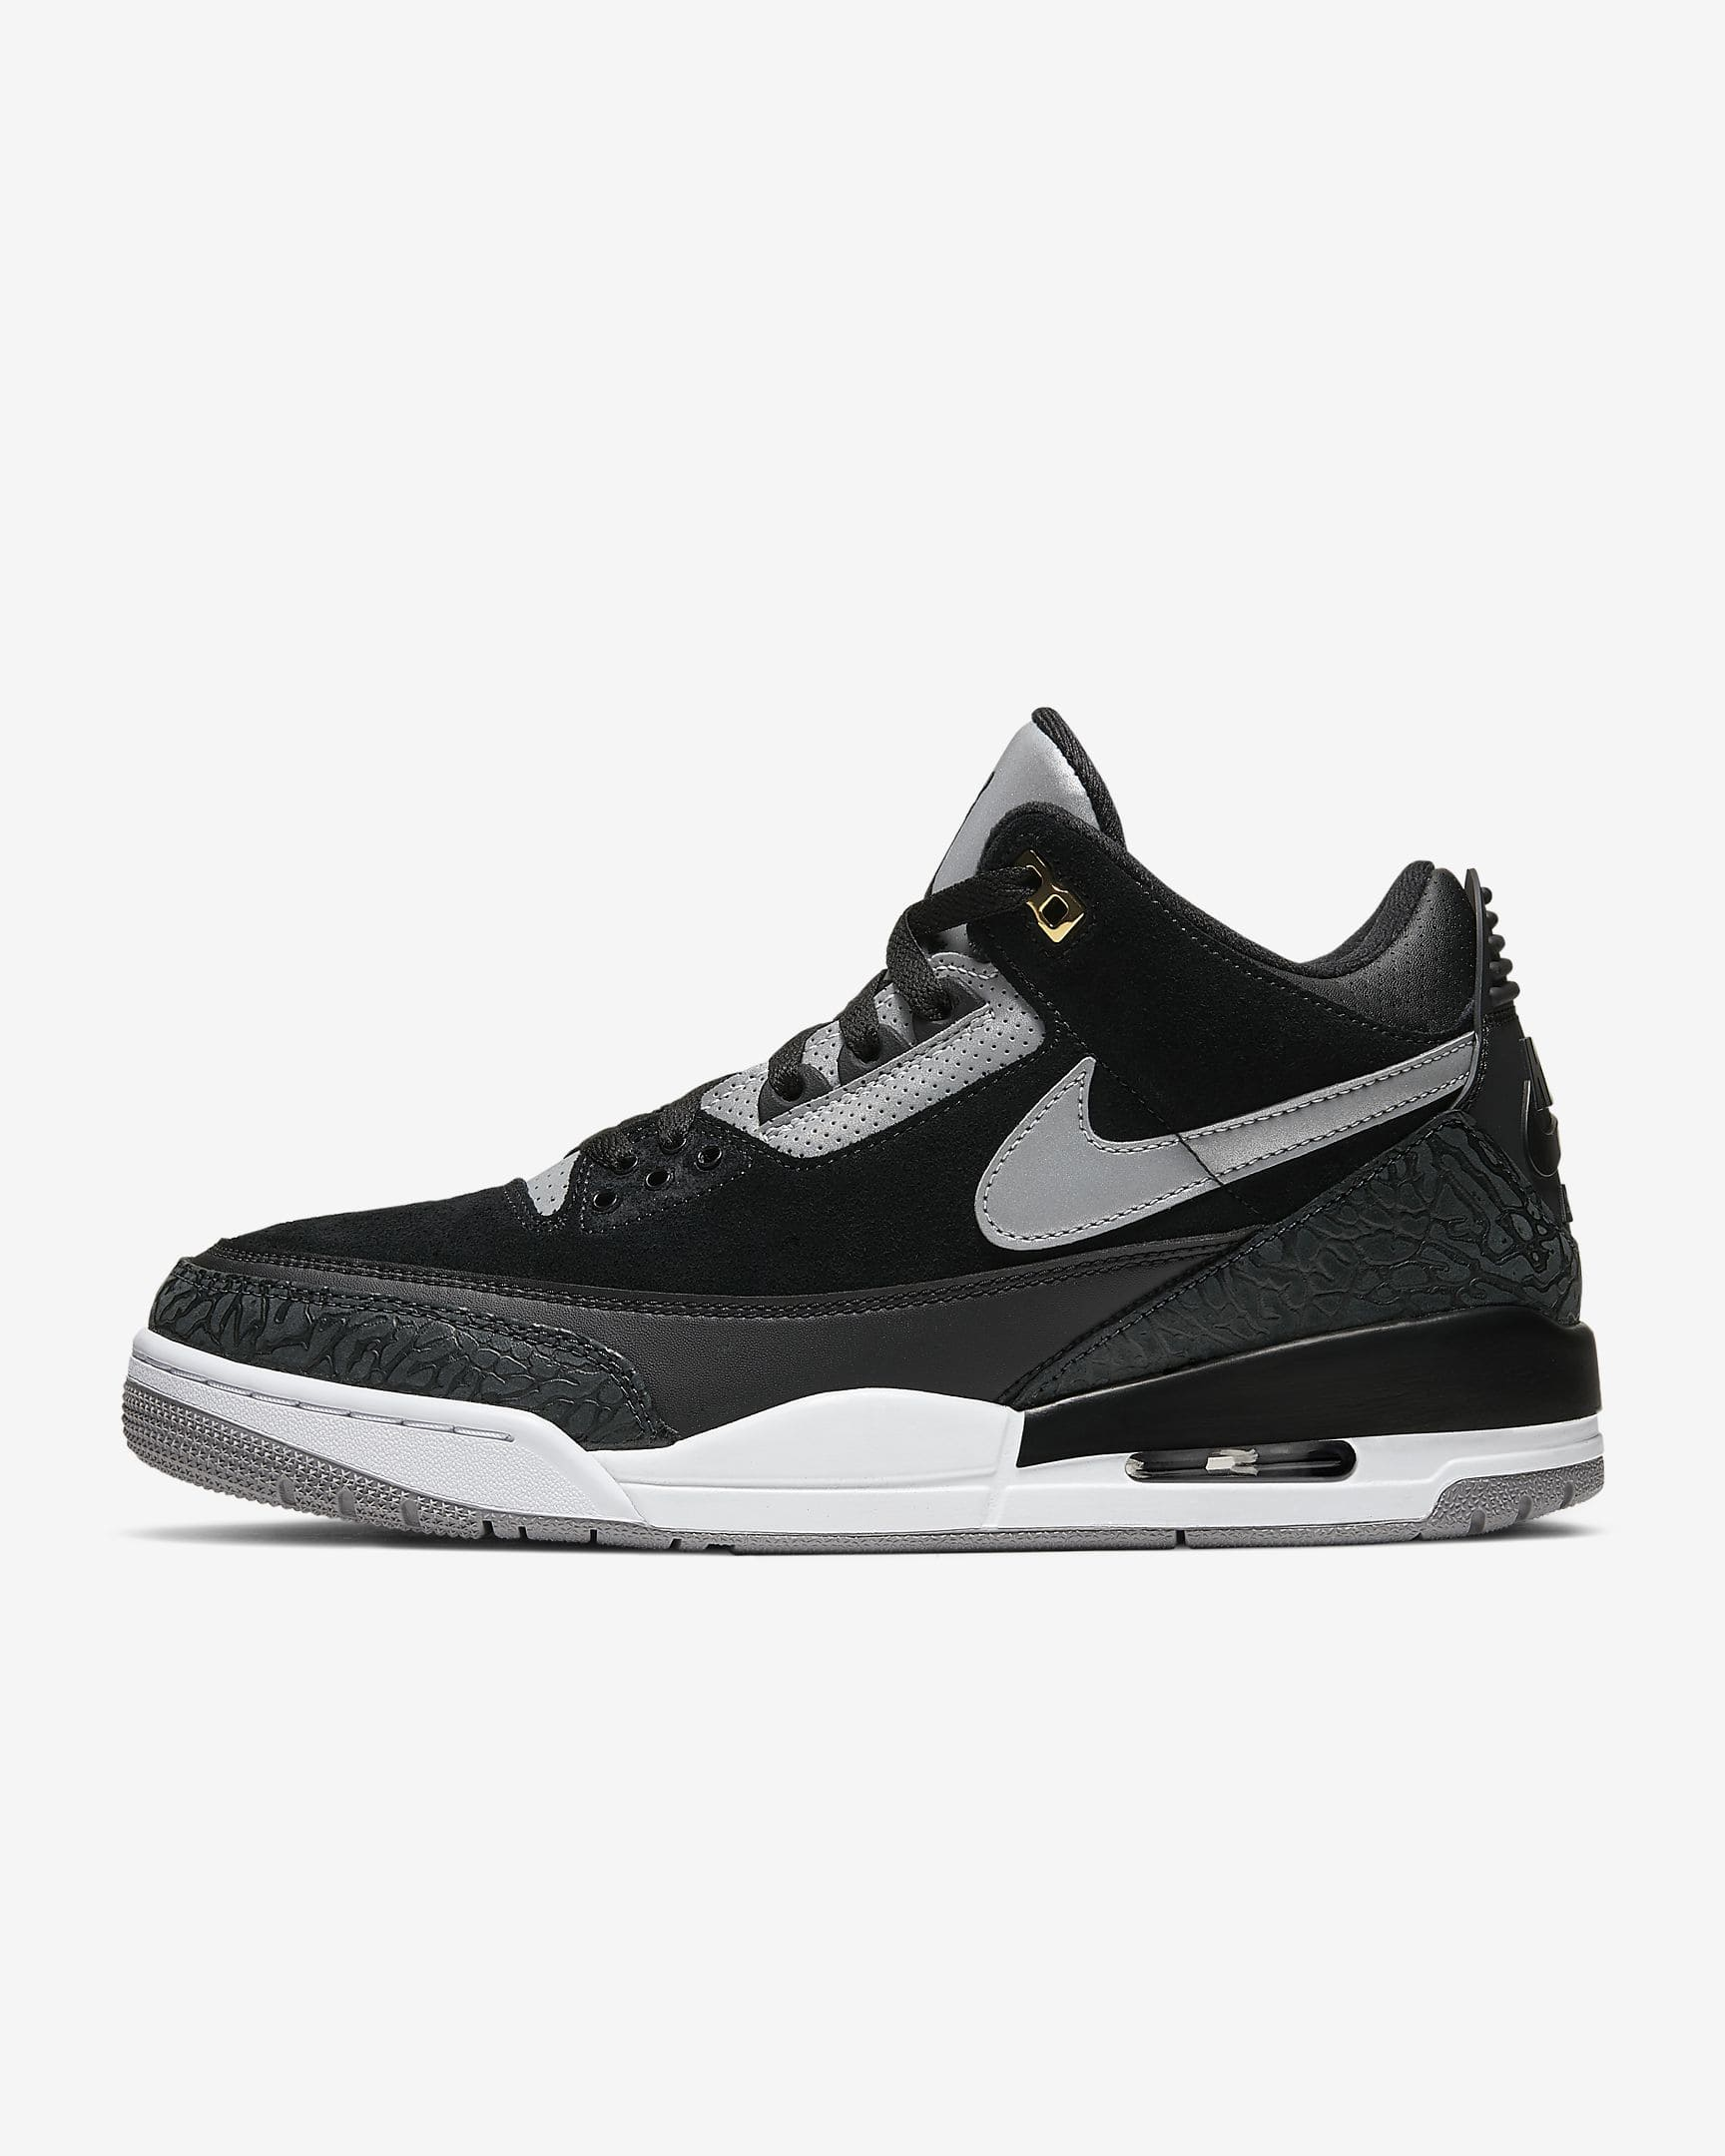 Air Jordan Men's 3 Retro Tinker Shoes